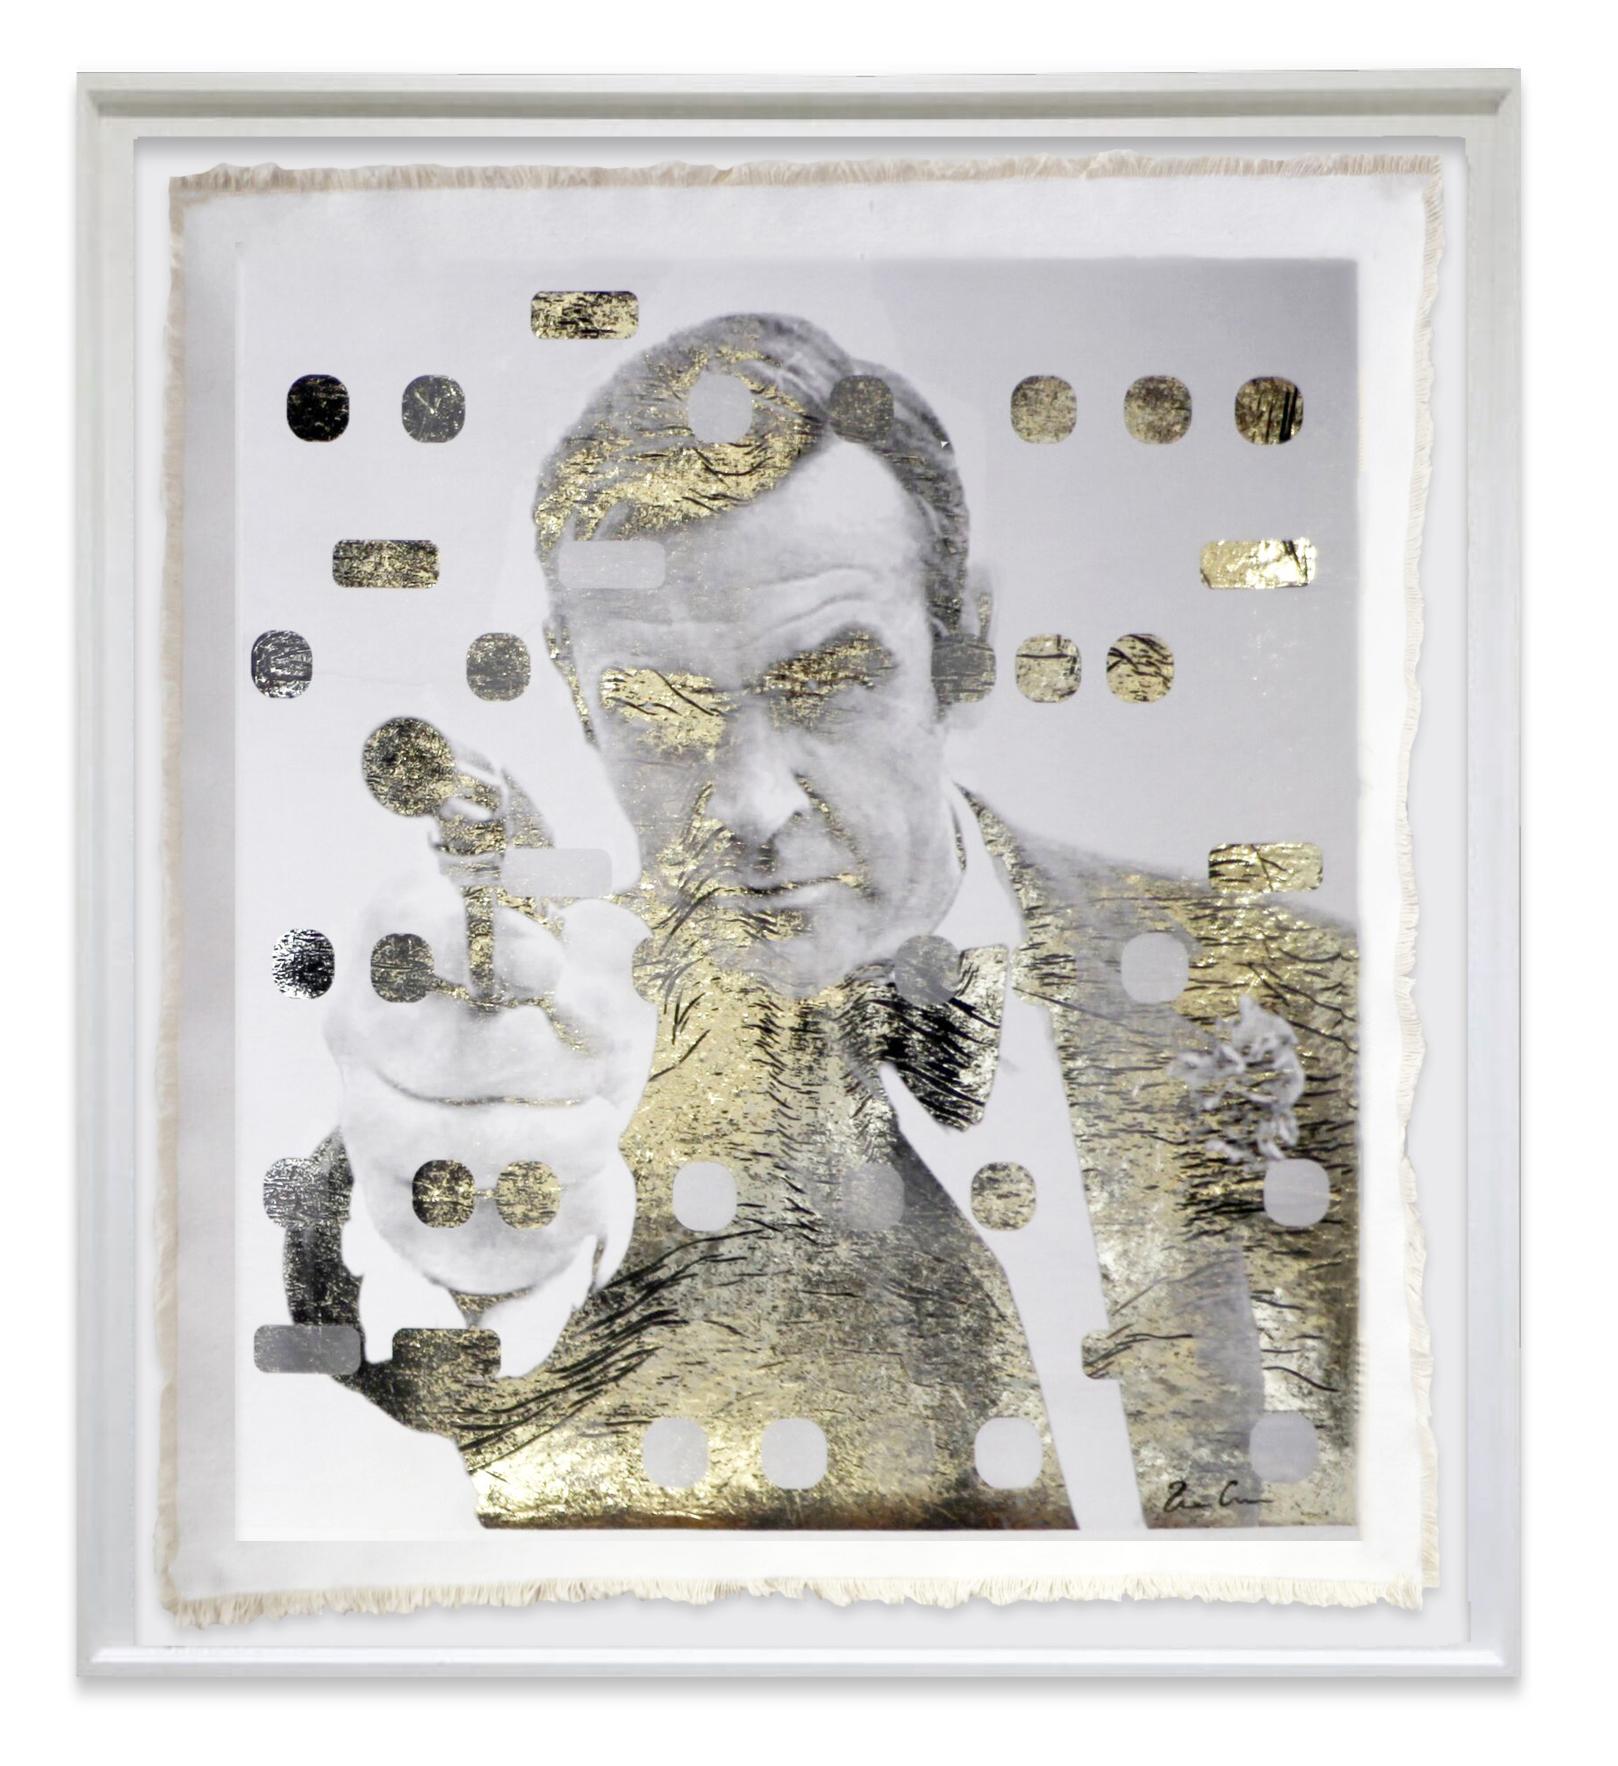 Sean Connery framed .jpg